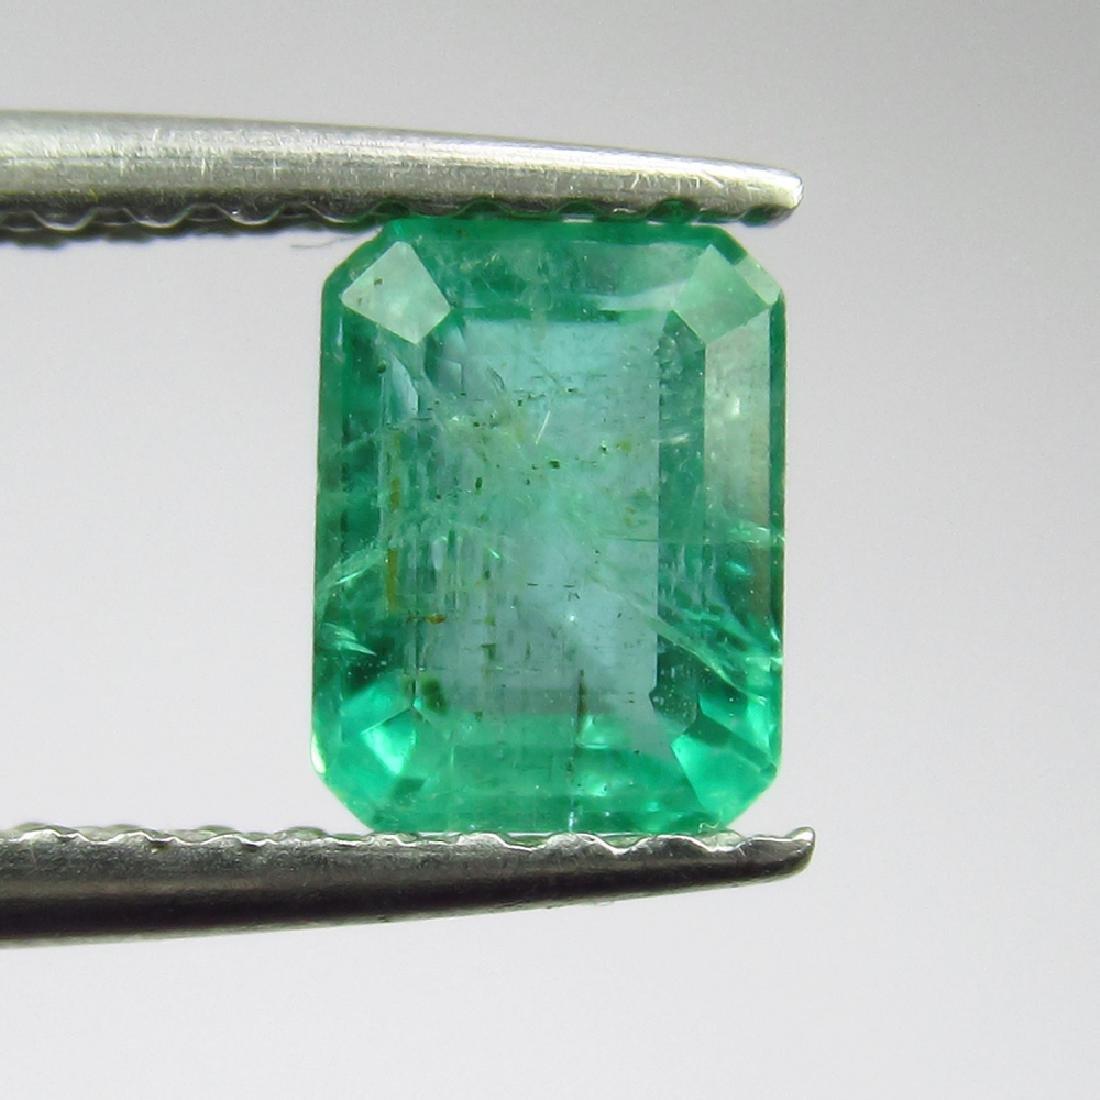 0.71 Ct Genuine Loose Zambian Emerald 5.5X4.5 mm